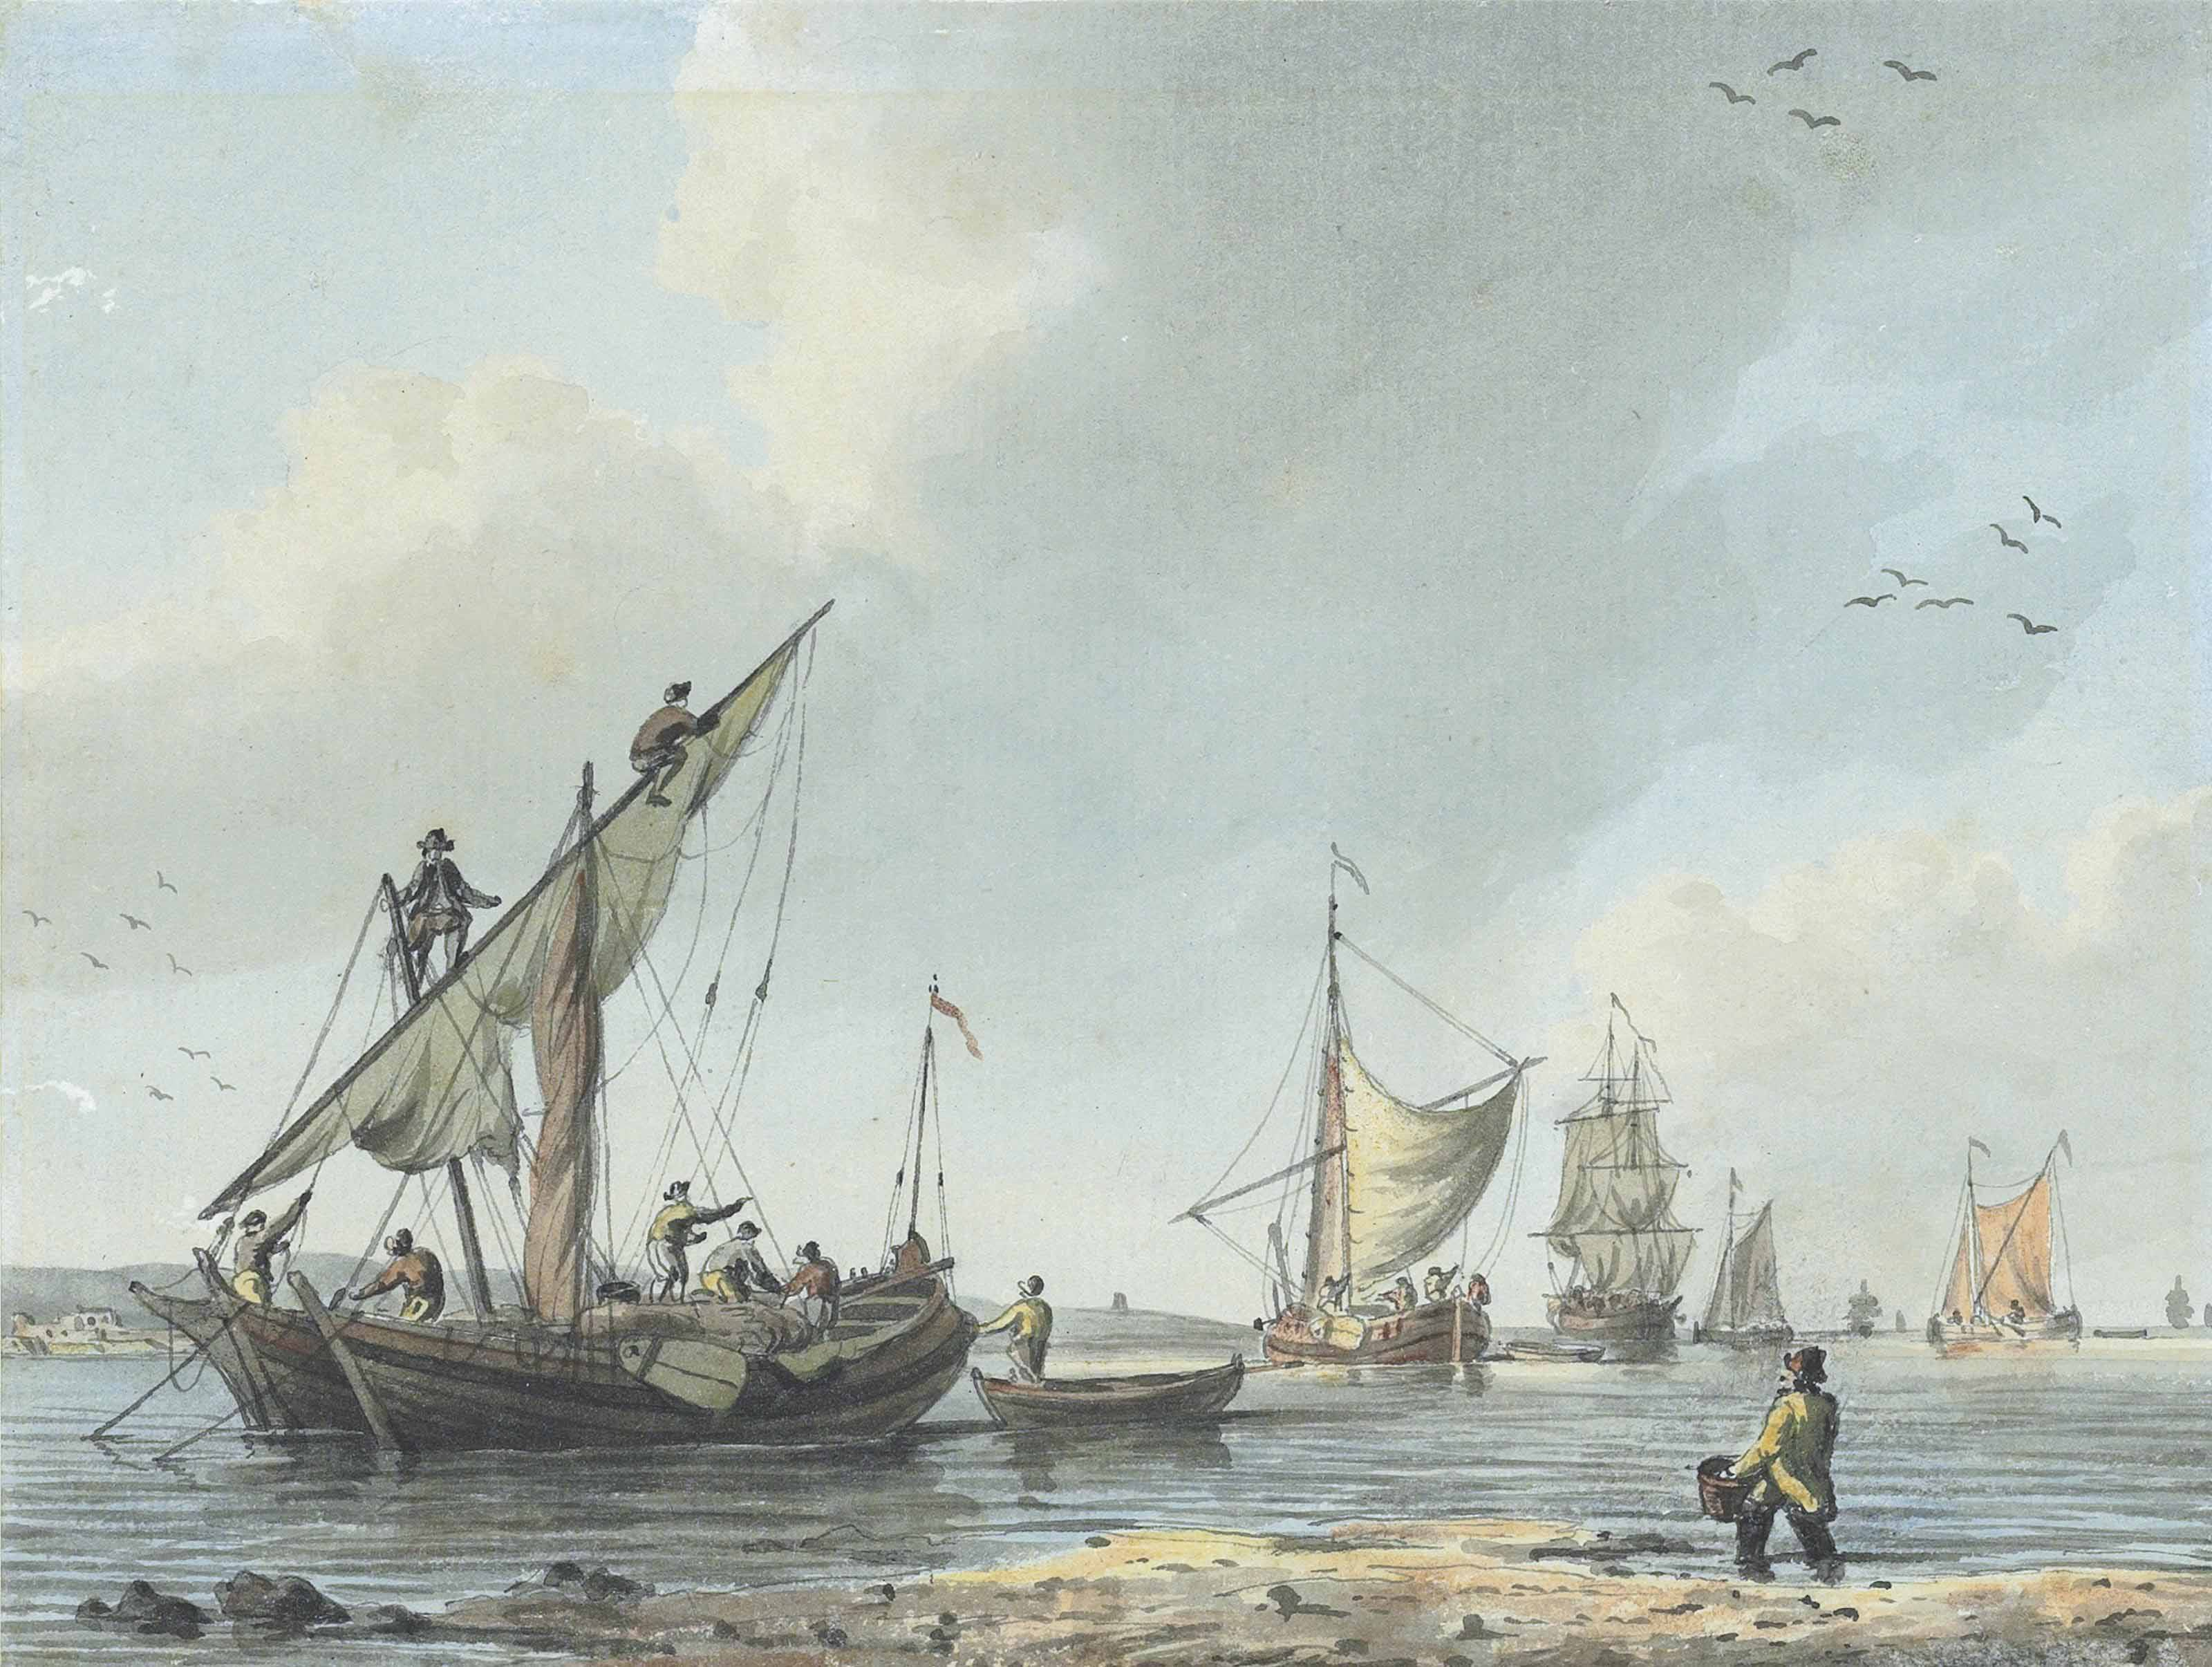 Robert Cleveley (Deptford 1747